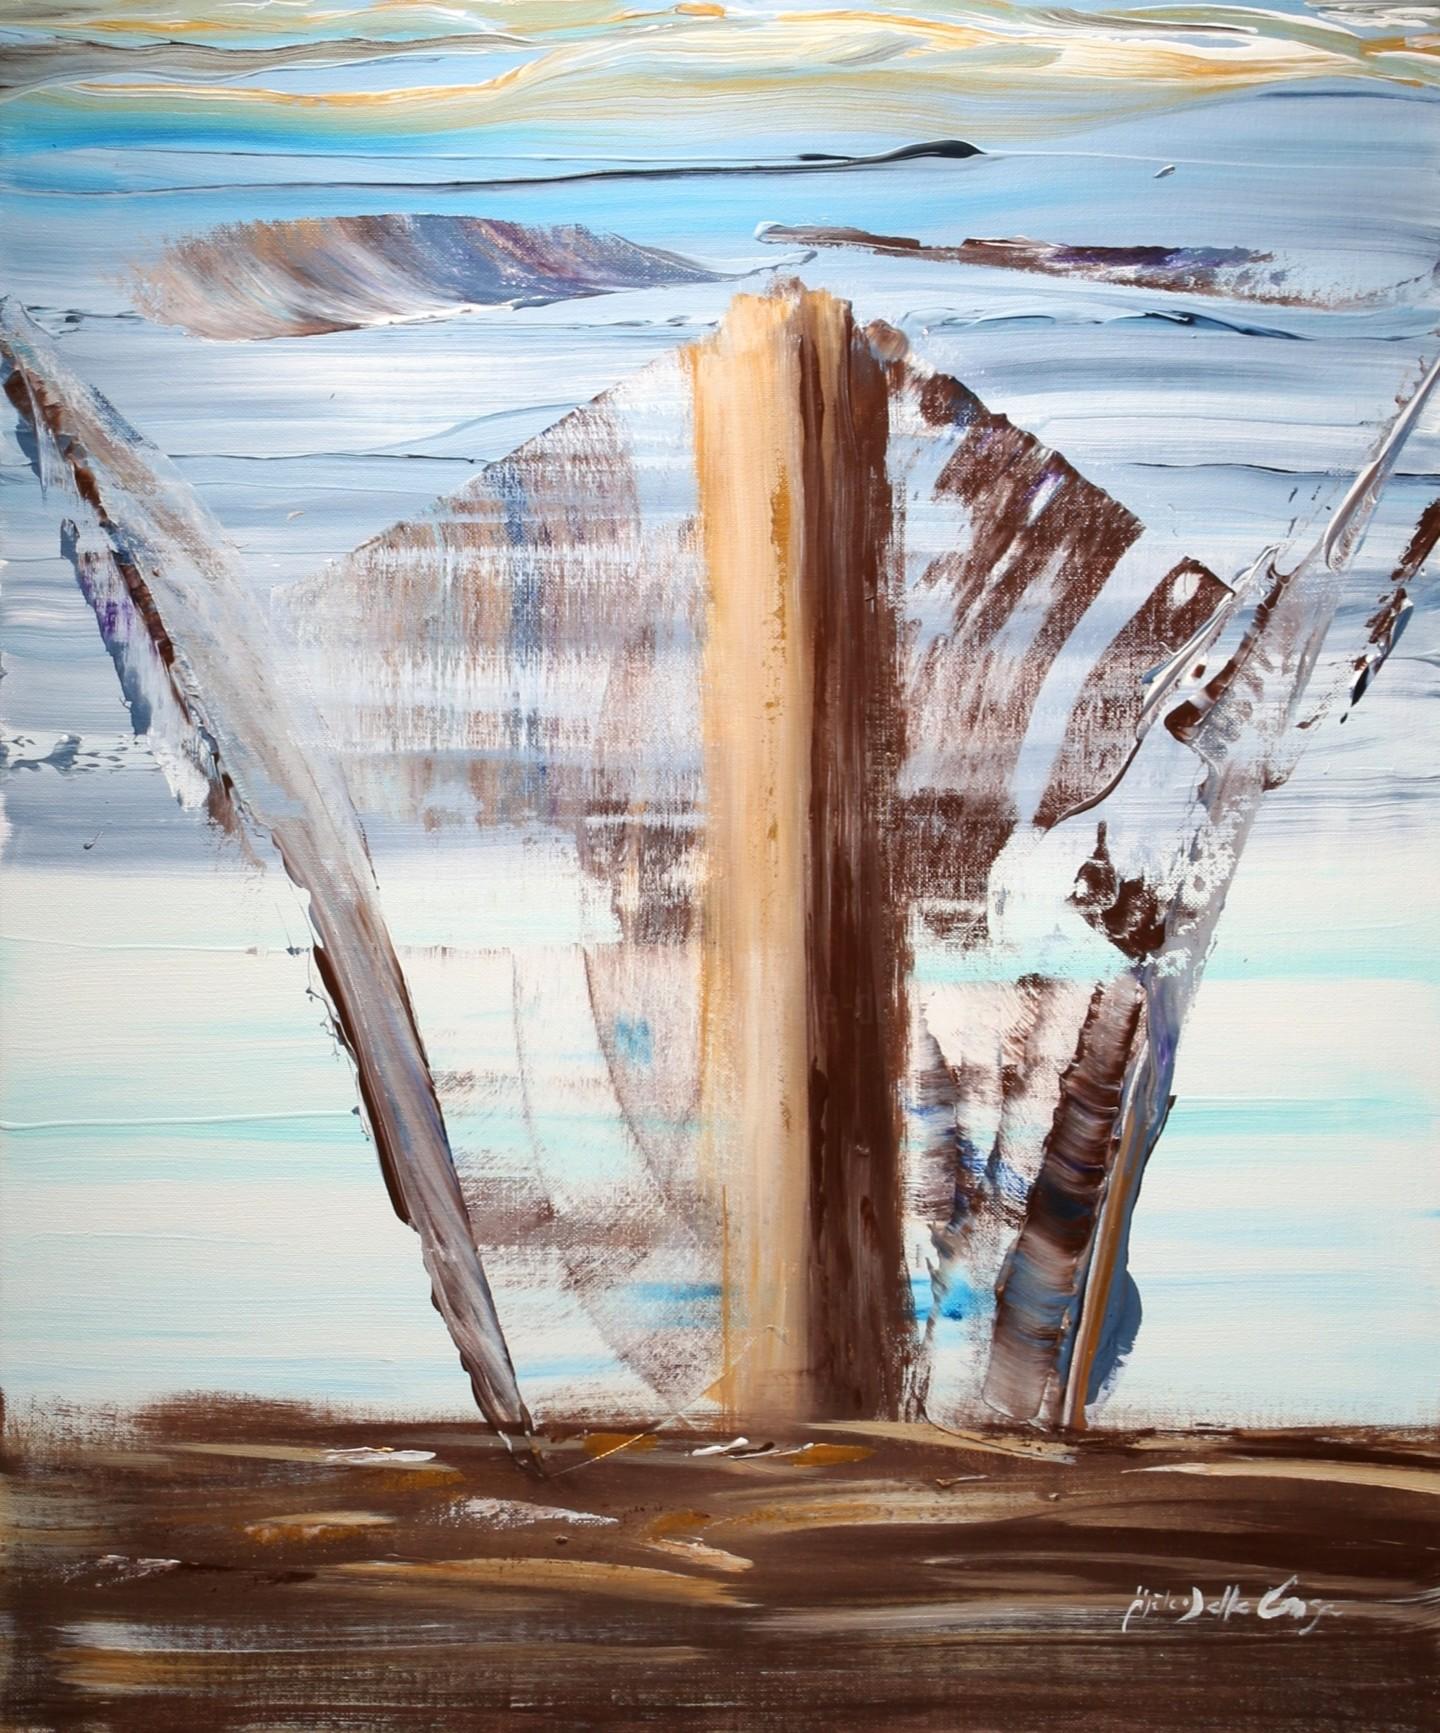 Gisèle Dalla Longa - sans-titre-vie-981-c-img-9363-acrylique-2016-oeuvre-de-gisele-dalla-longa.jpg